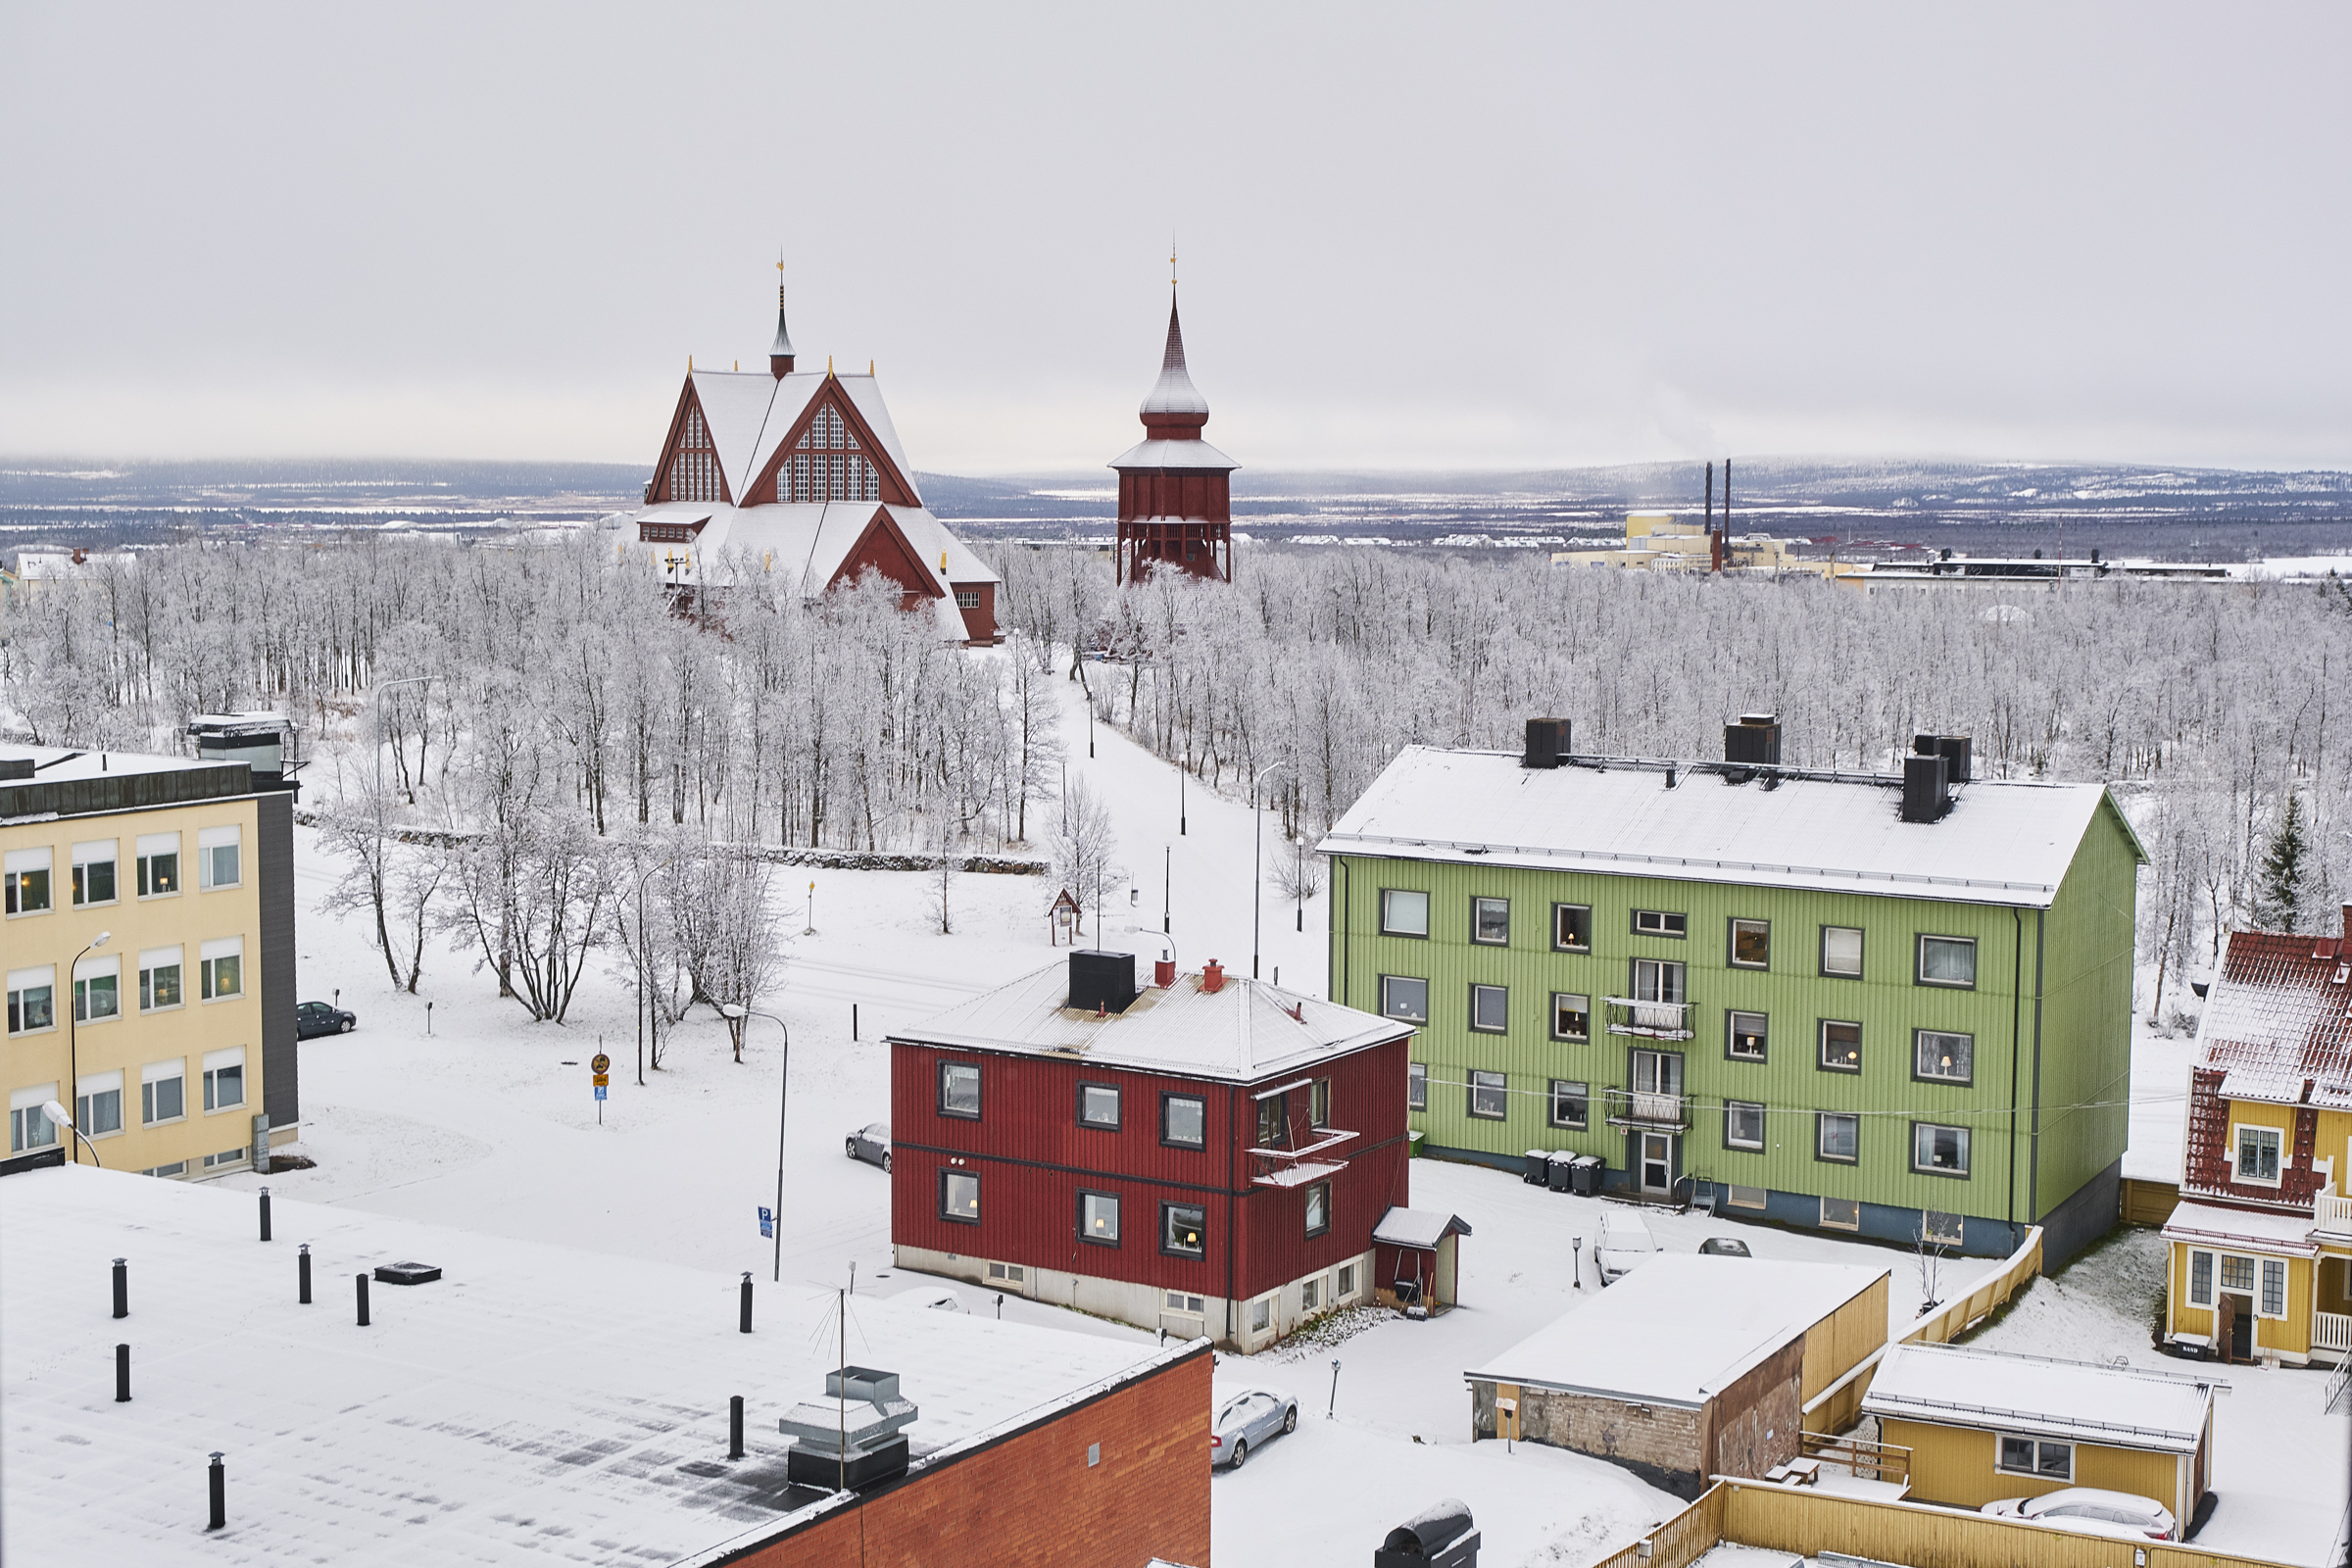 Kiruna_18-11-10_18597_2400px